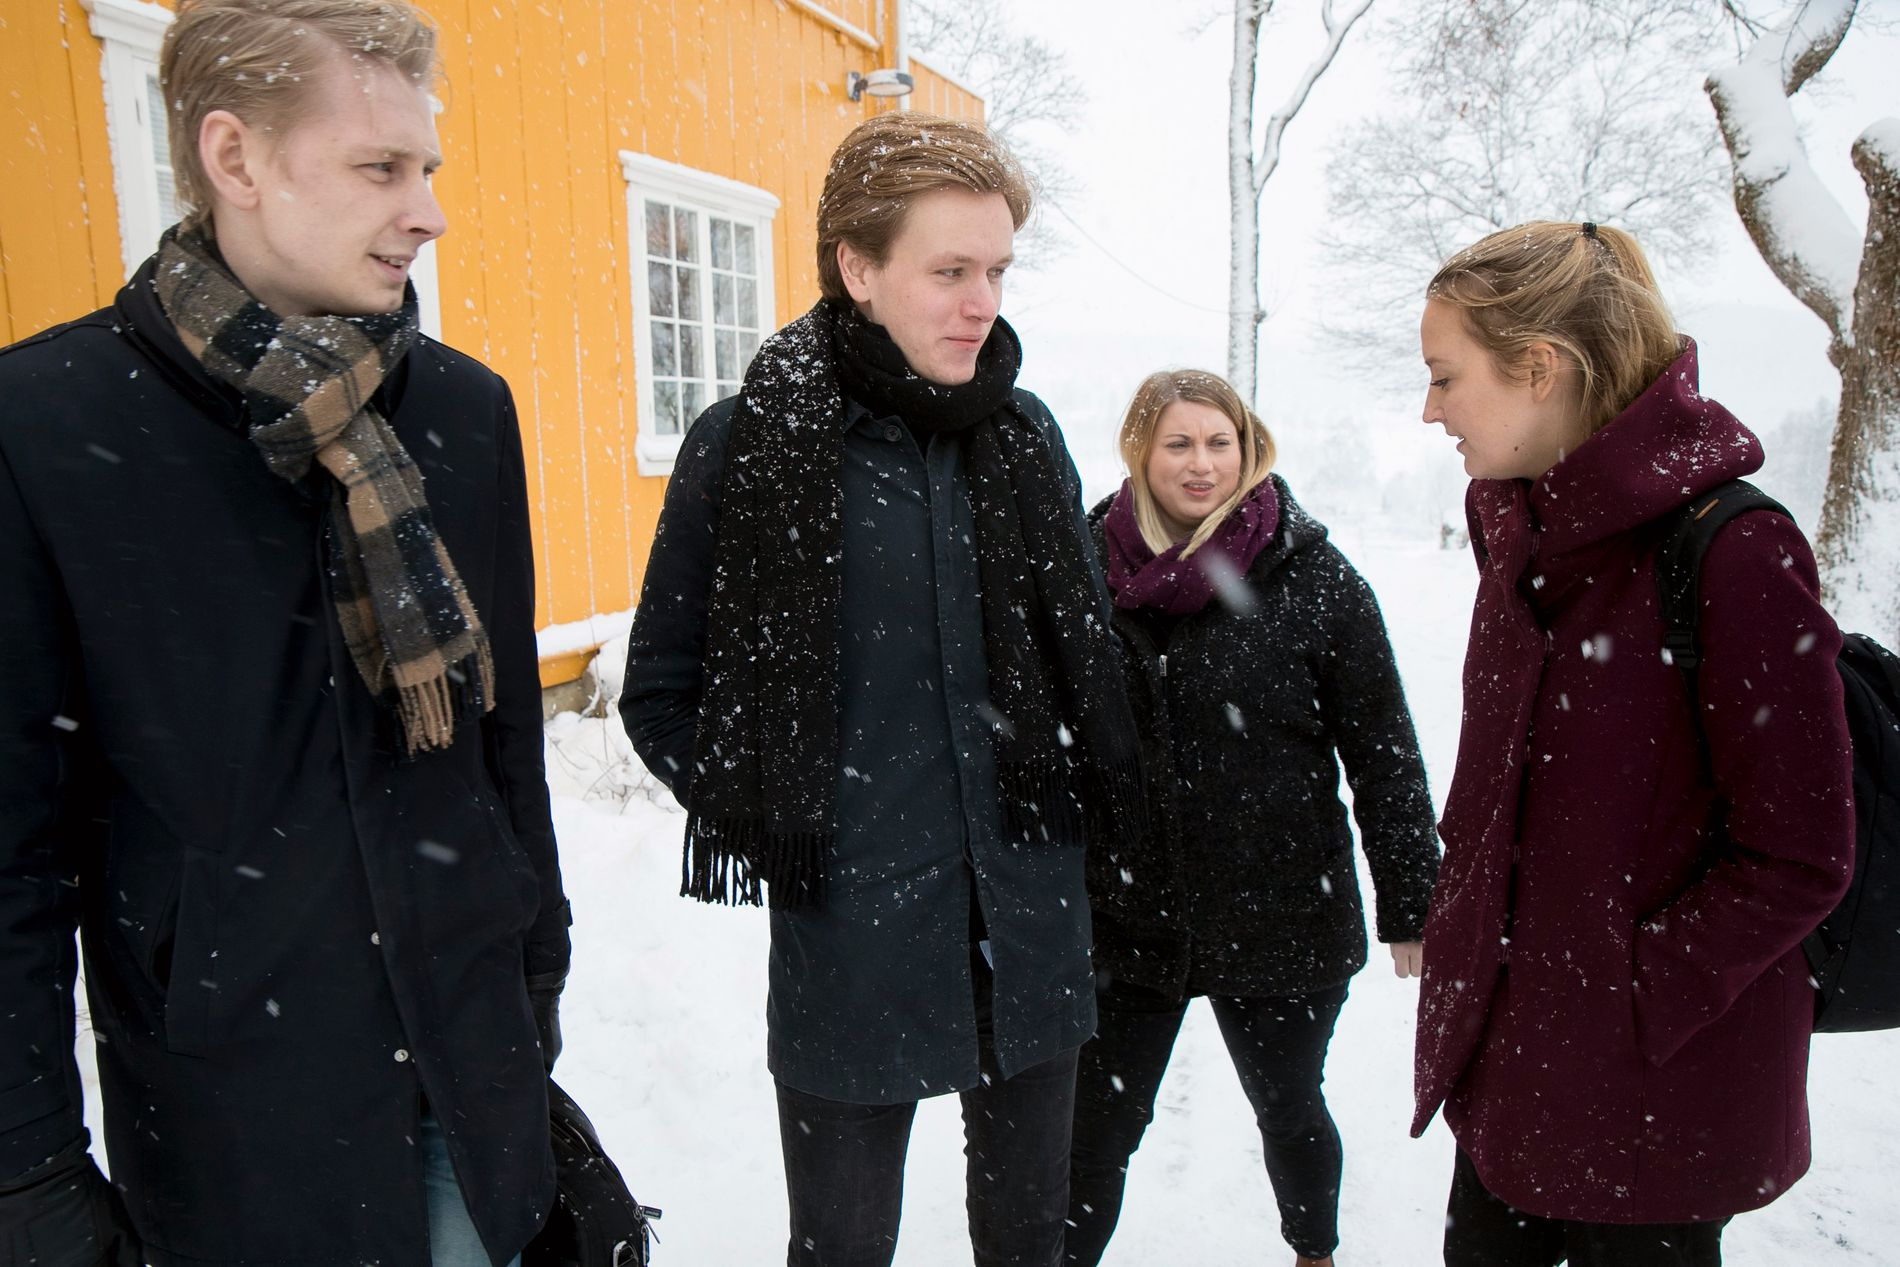 UENIGE:  Ungdomspartilederne i Fpu, Venstre og Høyre er kritiske til abort-endringer. Fra venstre: FpU-nestleder Andreas Brännström , unge Venstres leder Sondre Hansmark, KrFUs leder Martine Tønnessen, og unge Høyres leder Sandra Bruflot.